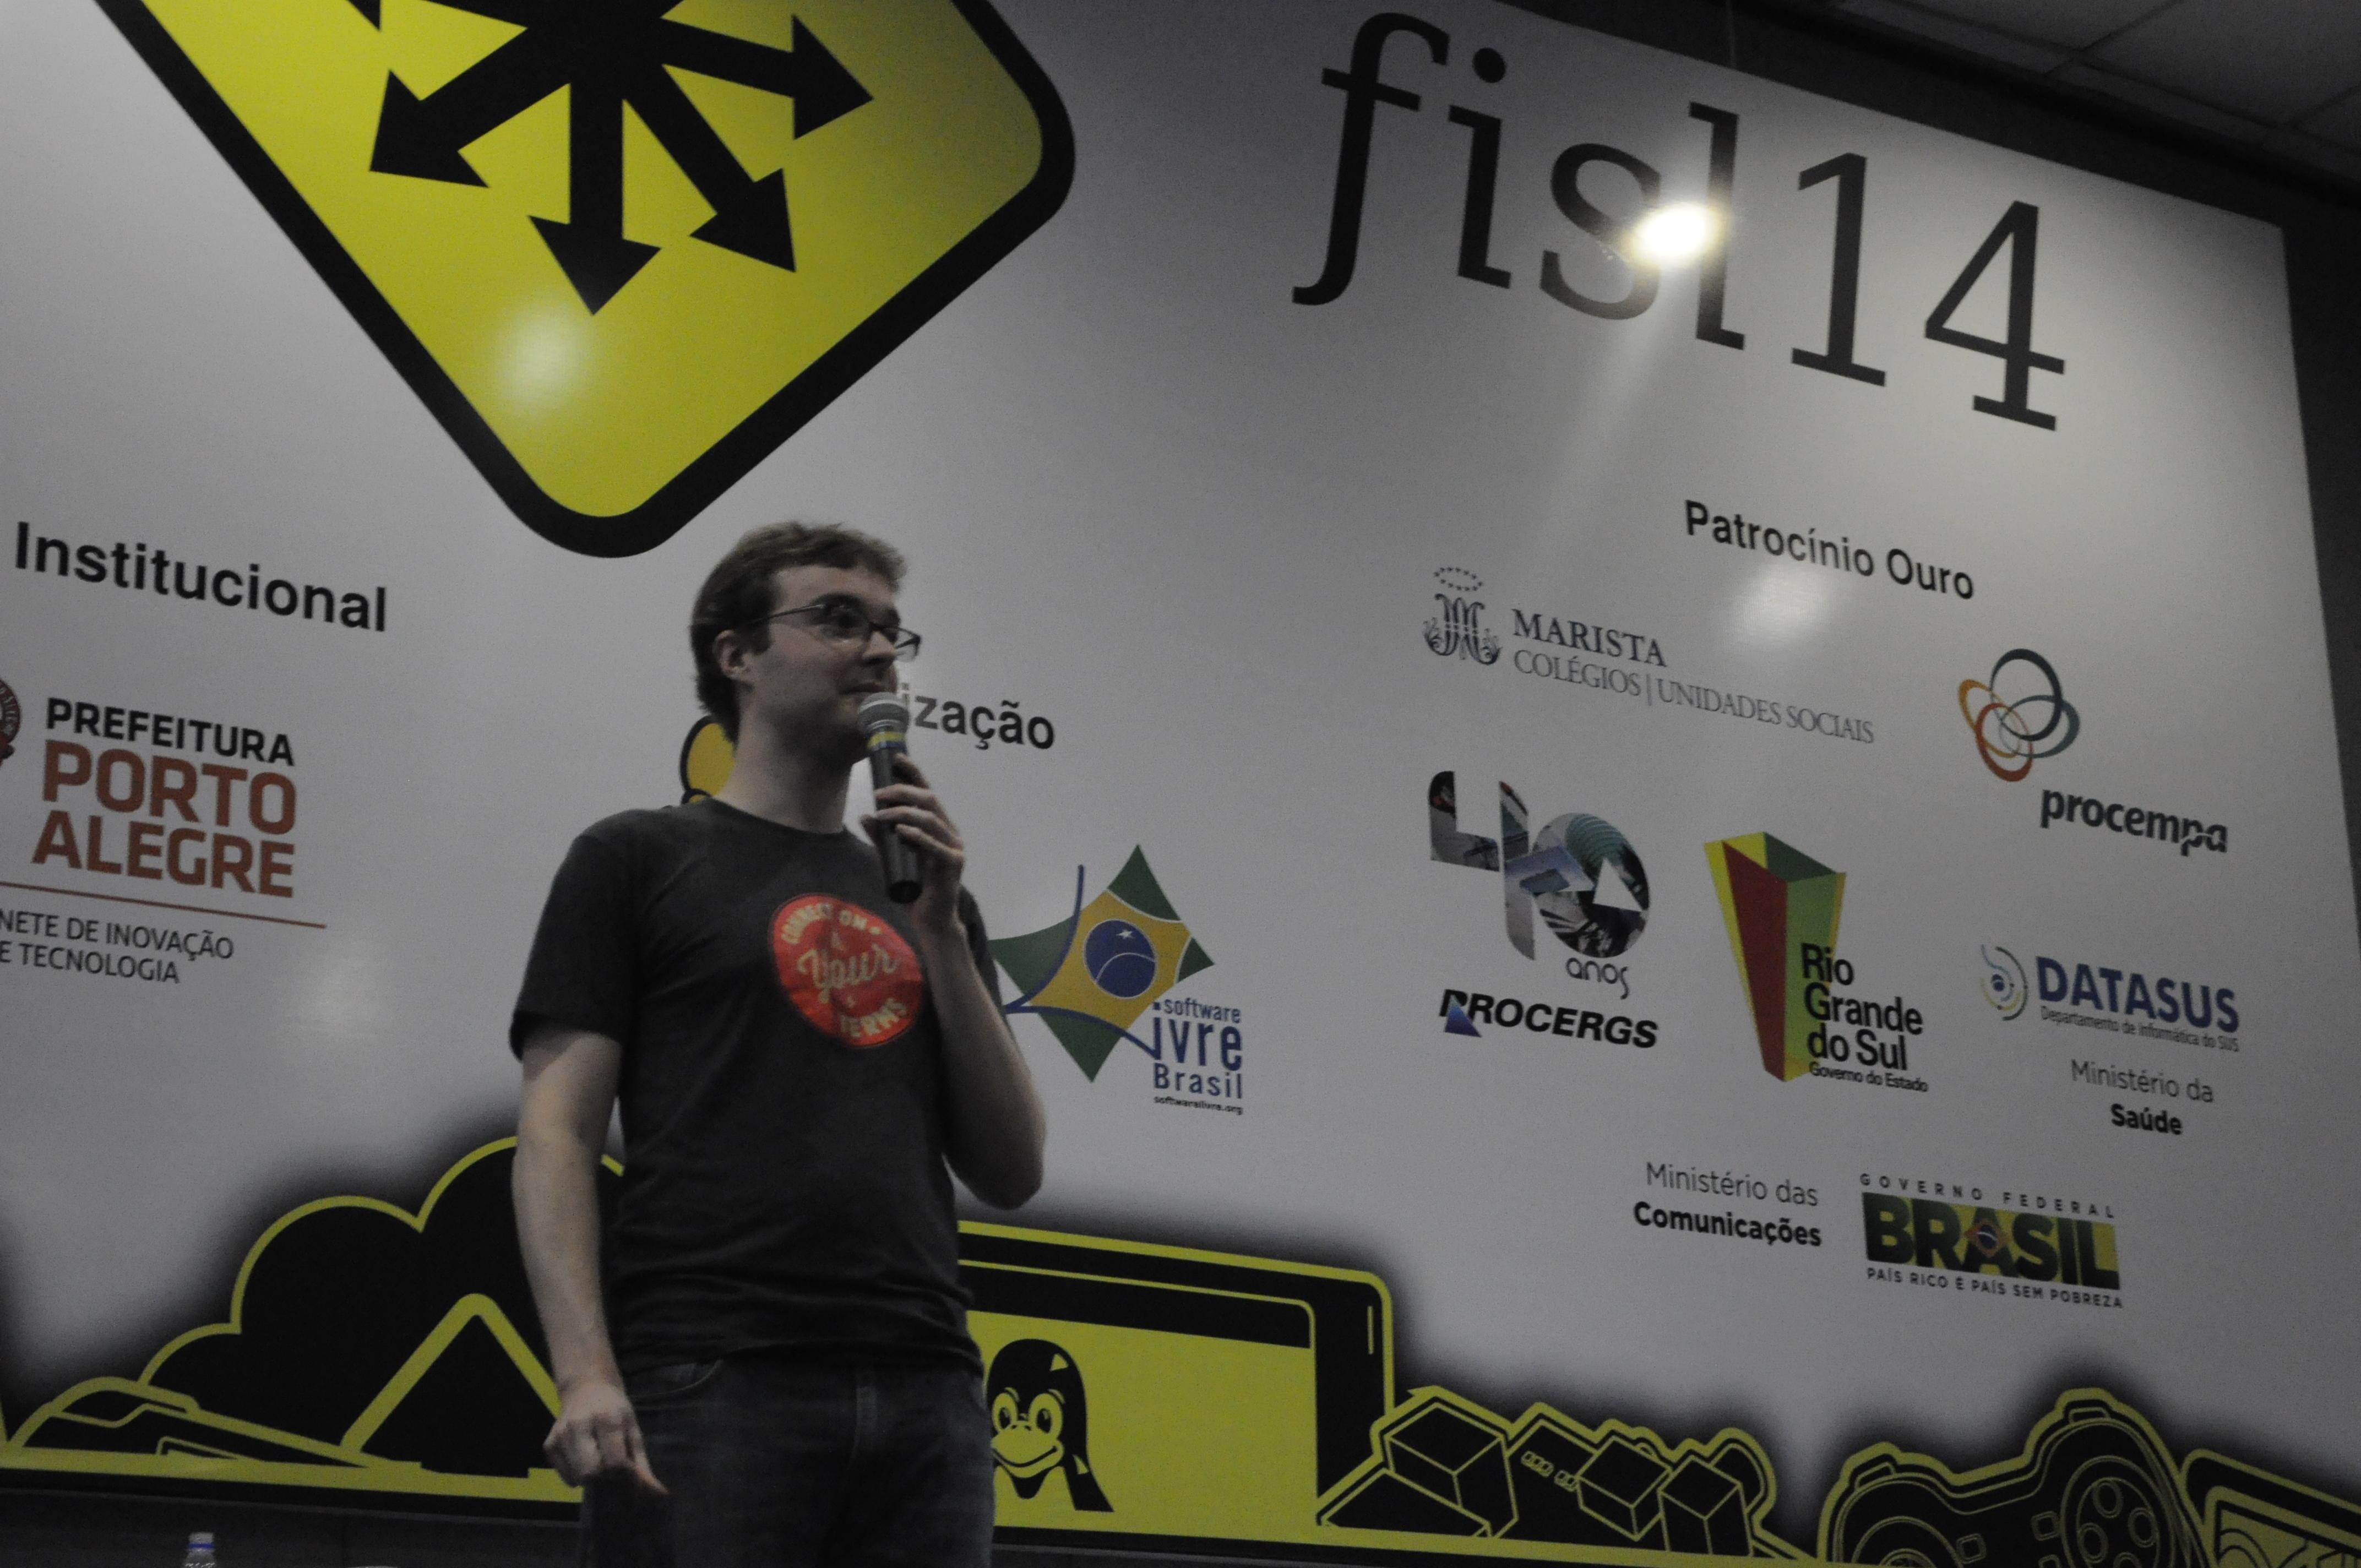 François apresenta o Mozilla Persona ao público do 14º Fisl (Foto: Giordano Tronco/Techtudo)